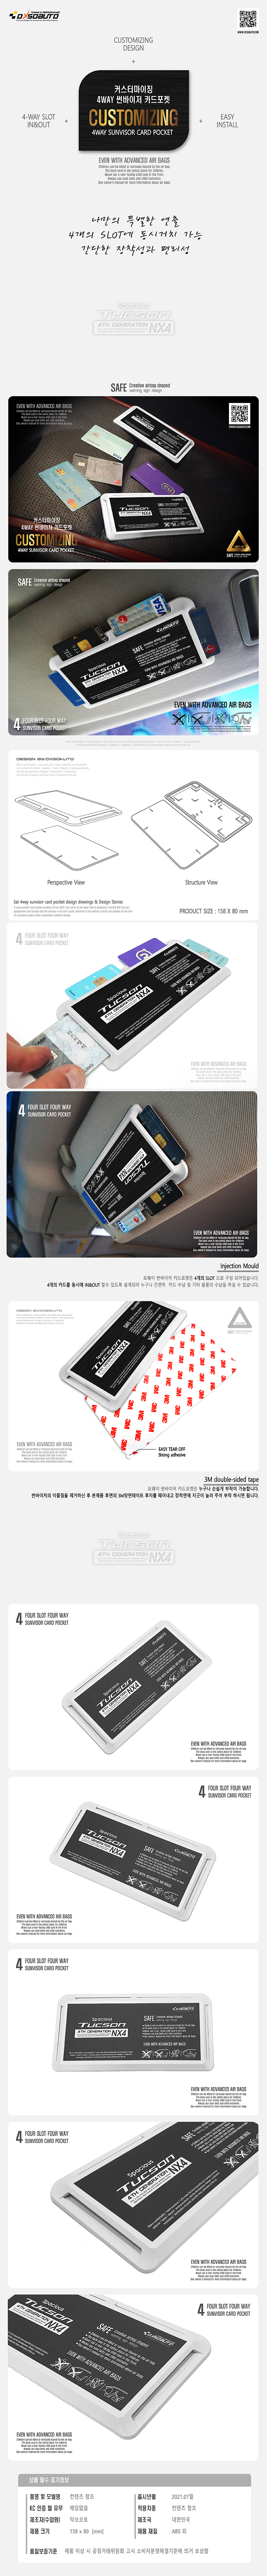 [DXSOAUTO] 커스터마이징 4WAY 썬바이저 카드포켓 (1EA / 1SET) 디 올 뉴 투싼 NX4 화이트